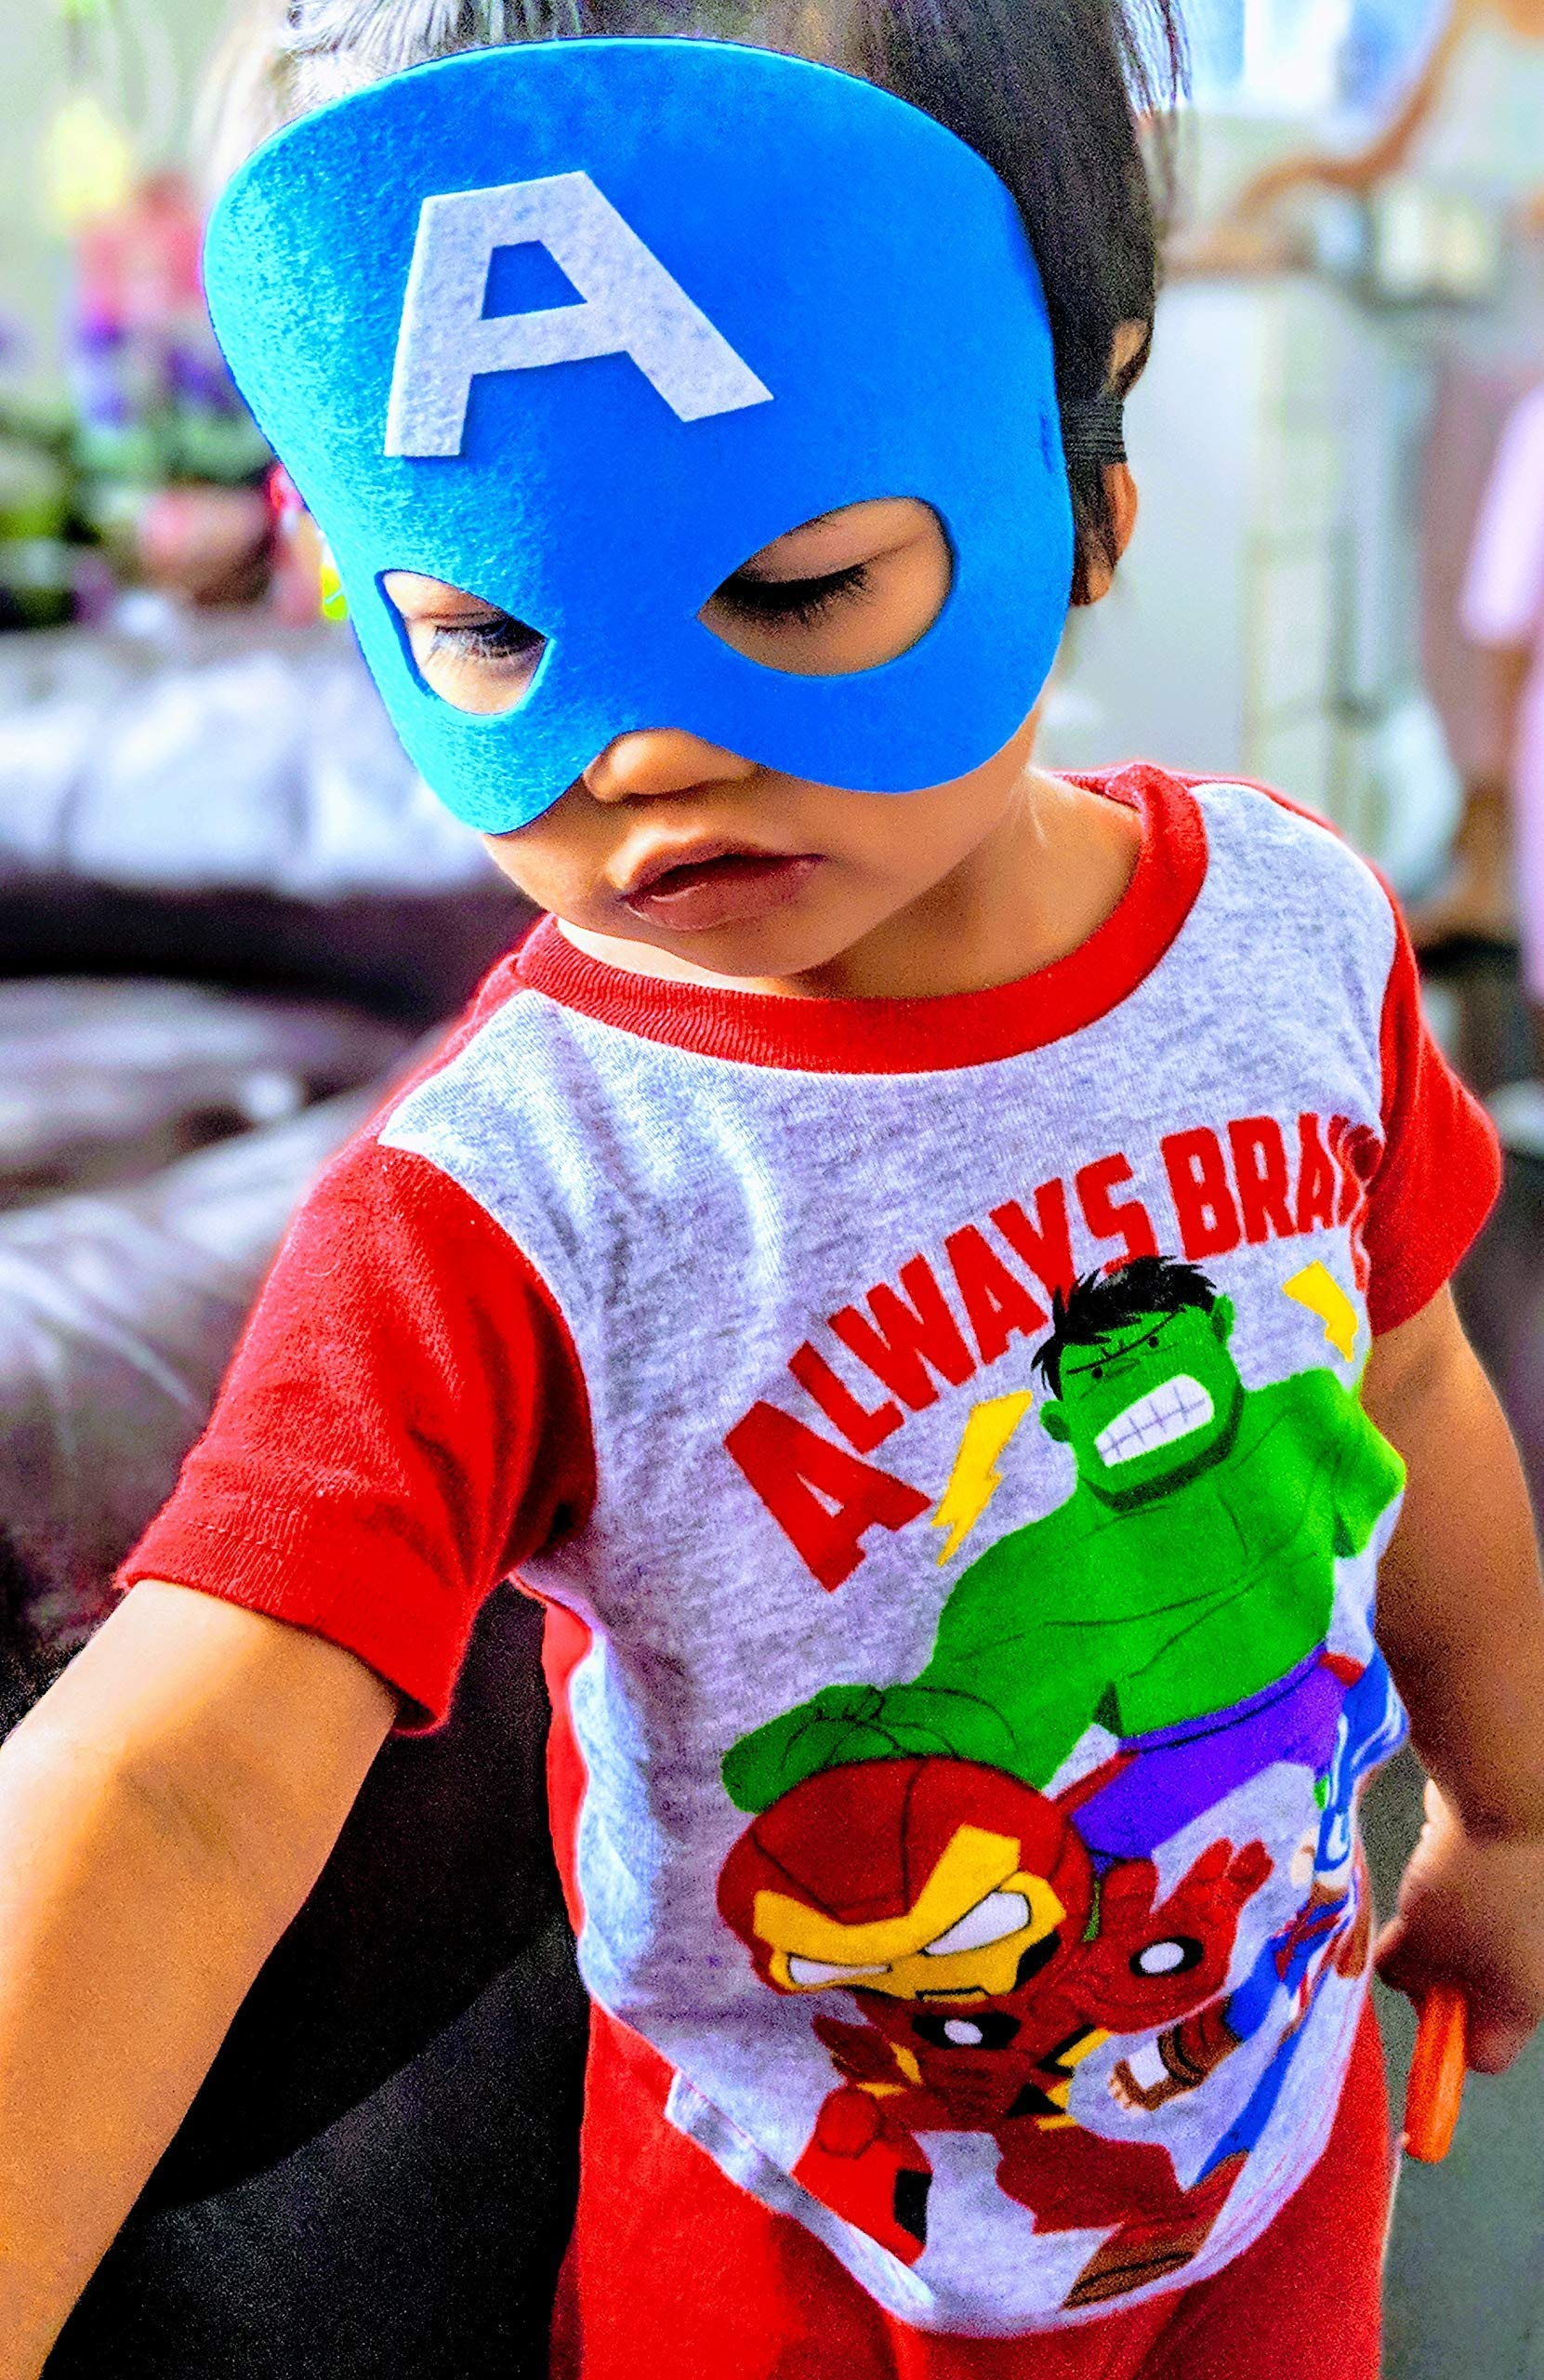 HXDZFX 24PCS Superhero Party Masks /& Superhero Slap Bracelet for Kids Baby The Avengers Super Heroes Birthday Party Supplies Favors Children//Kids//Adults